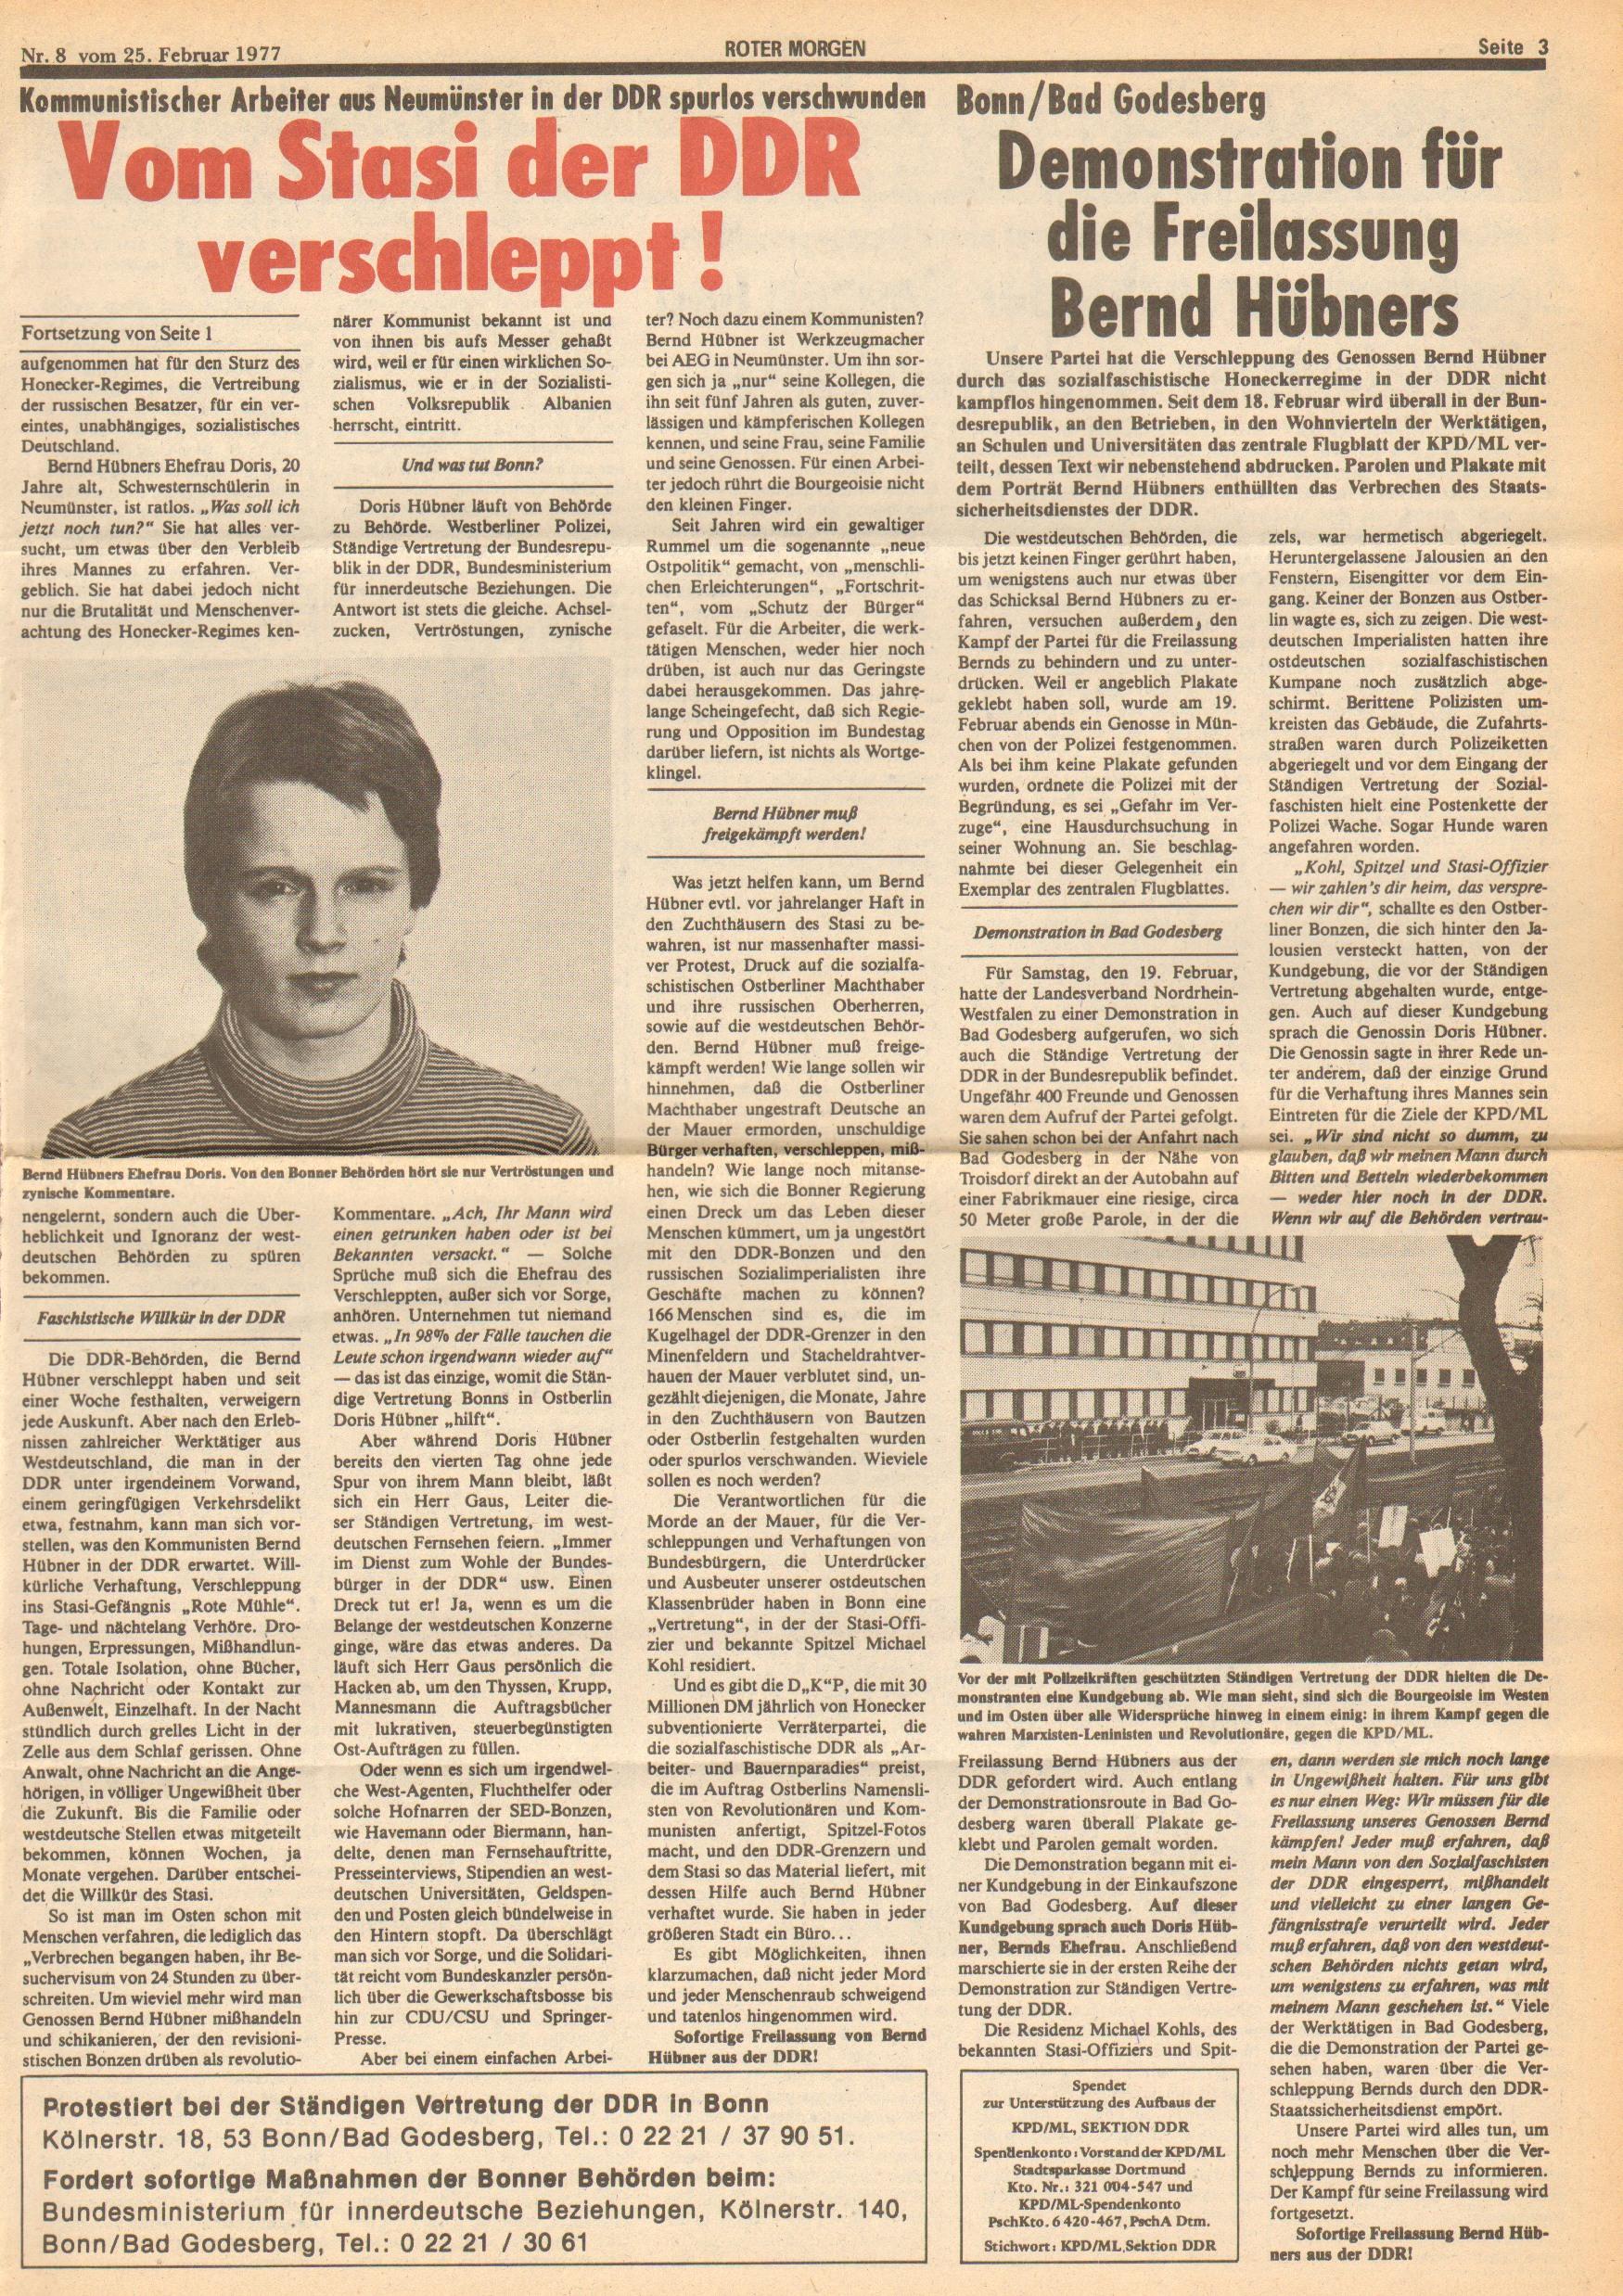 Roter Morgen, 11. Jg.,25. Februar 1977, Nr. 8, Seite 3